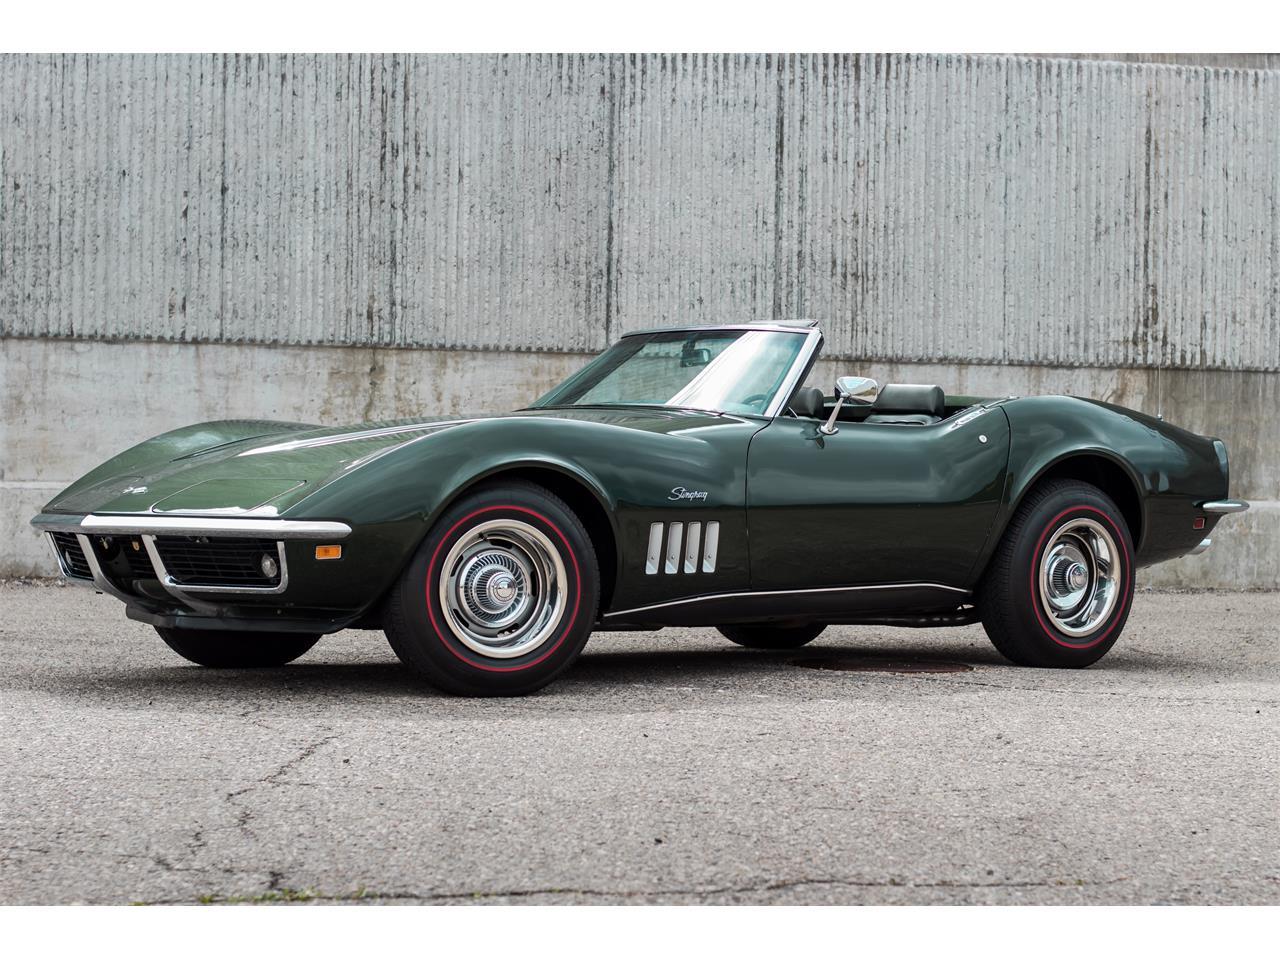 For Sale: 1969 Chevrolet Corvette Stingray in Pontiac, Michigan